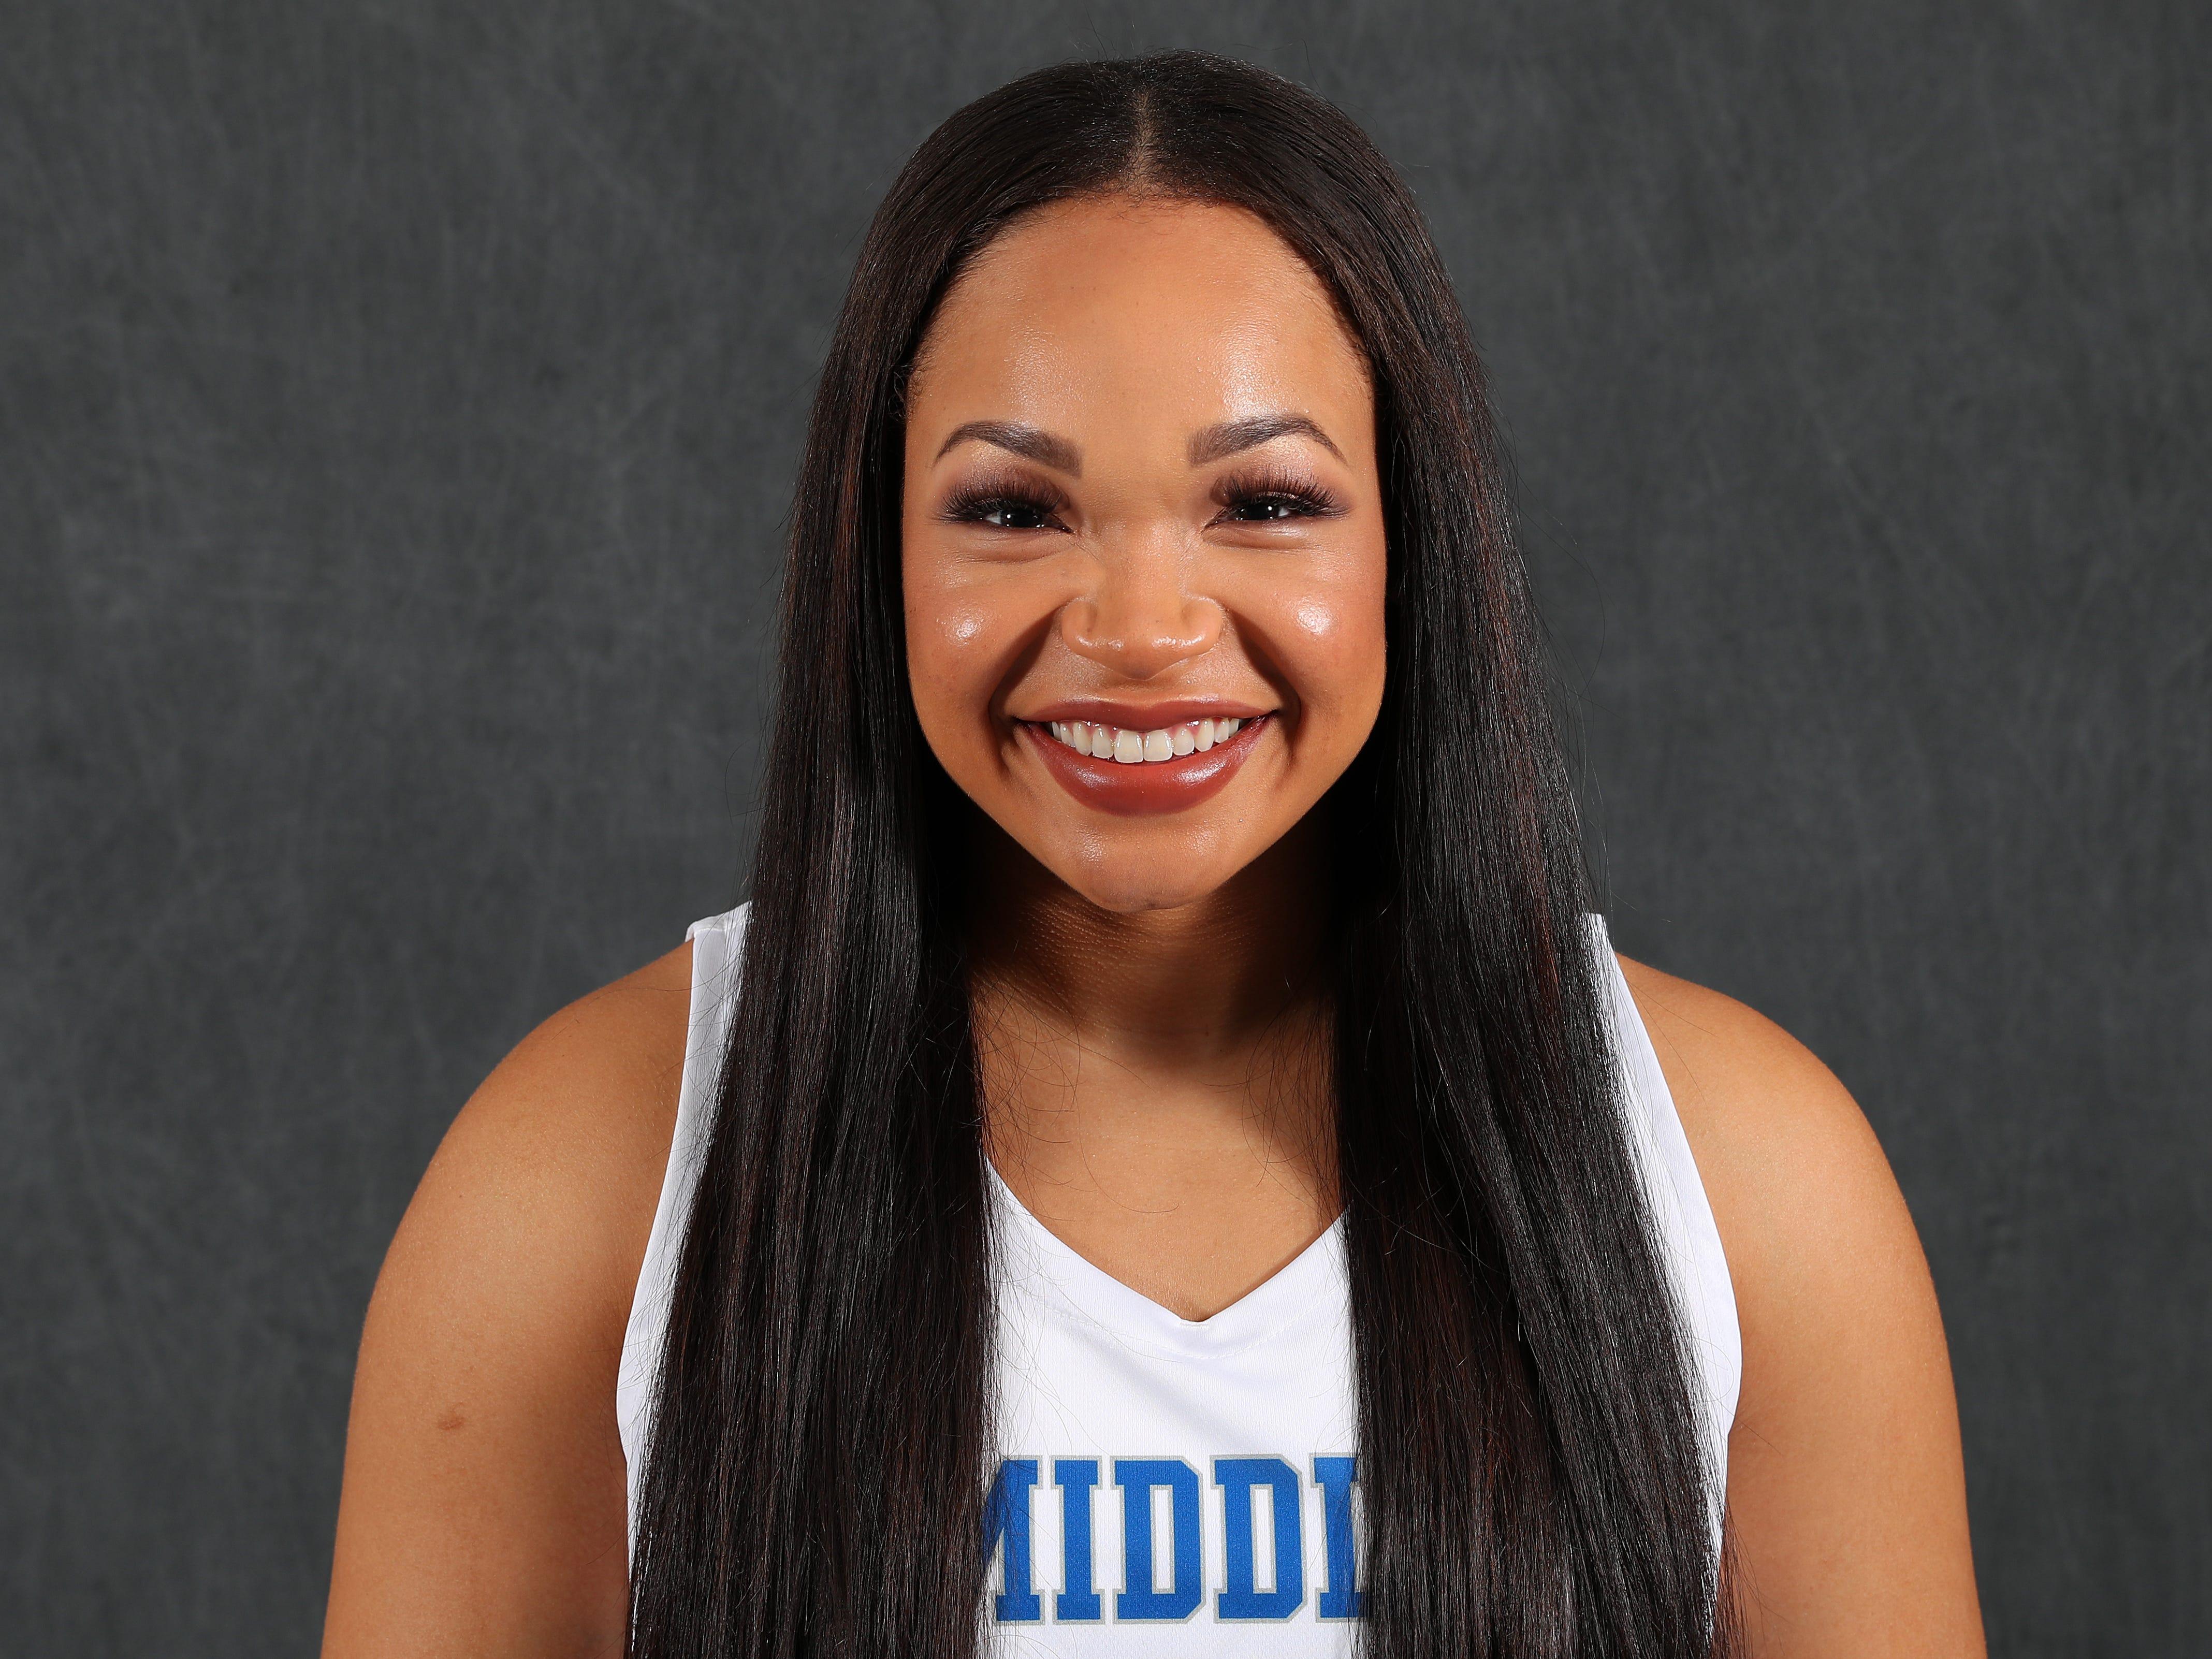 MTSU women's basketball player Alex Johnson